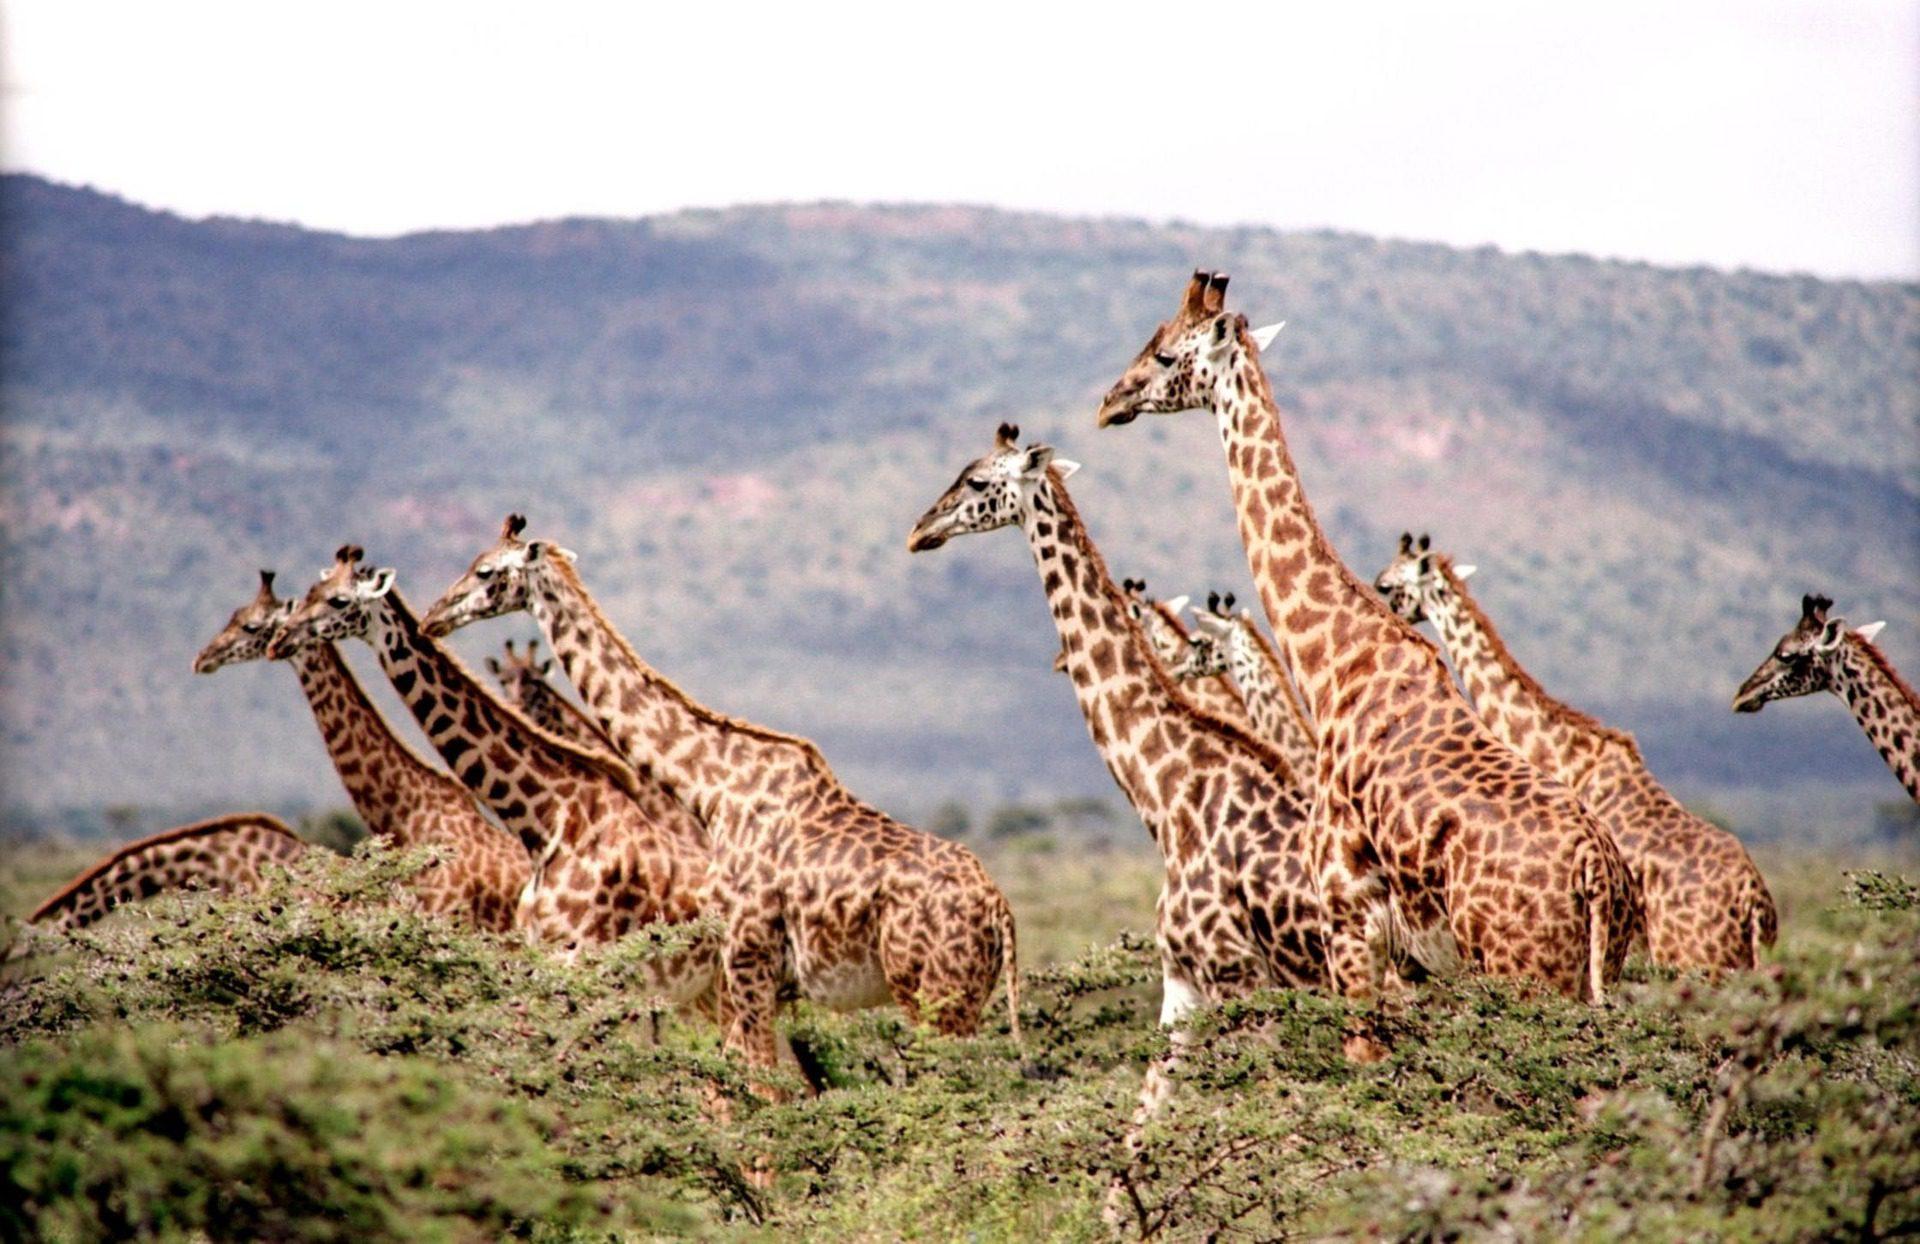 Giraffes, African Safari, Africa